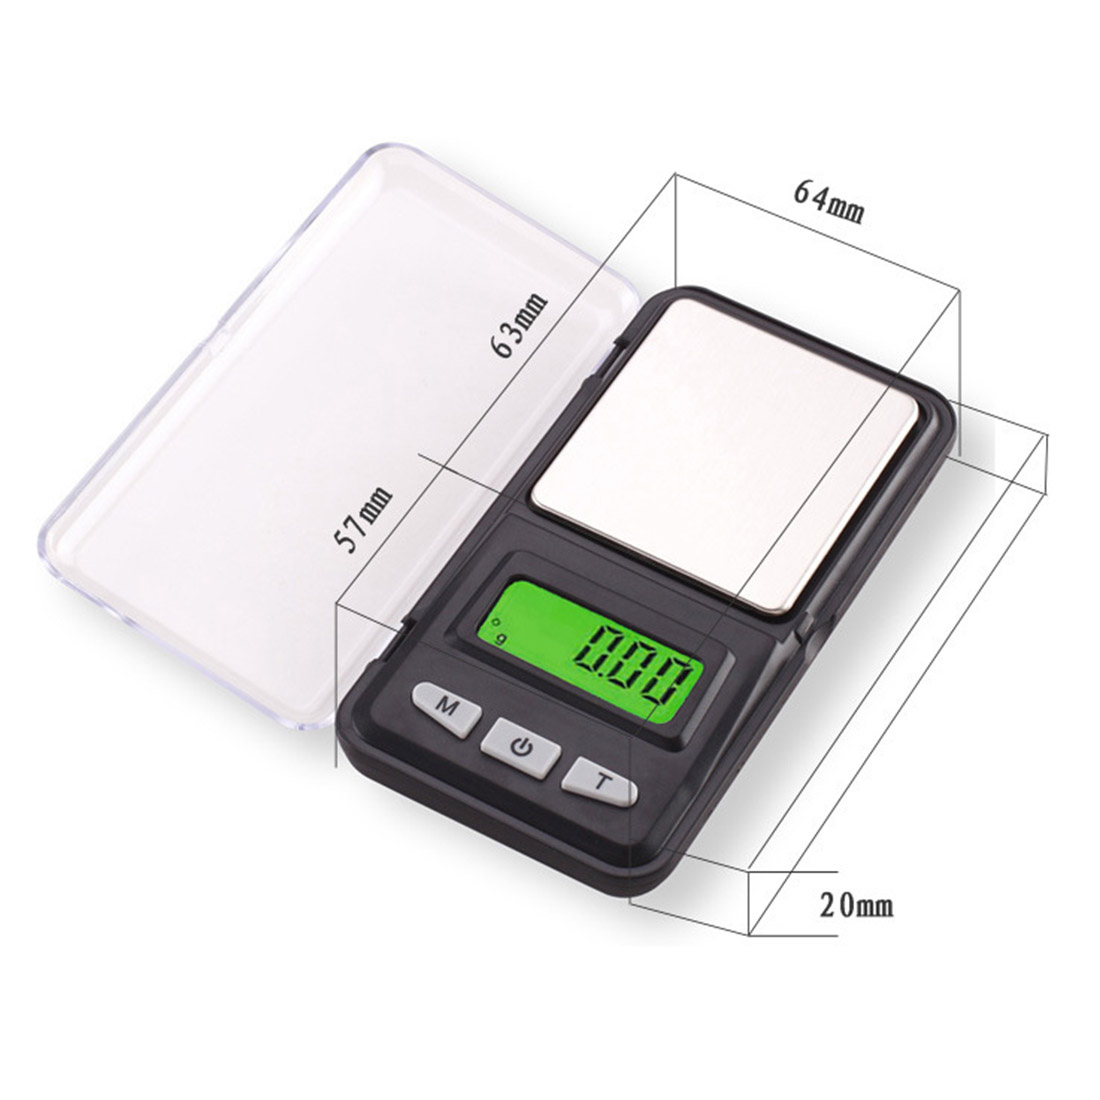 LCD Display Gram Weight Balance Weighing Digital Pocket Scales Electronic